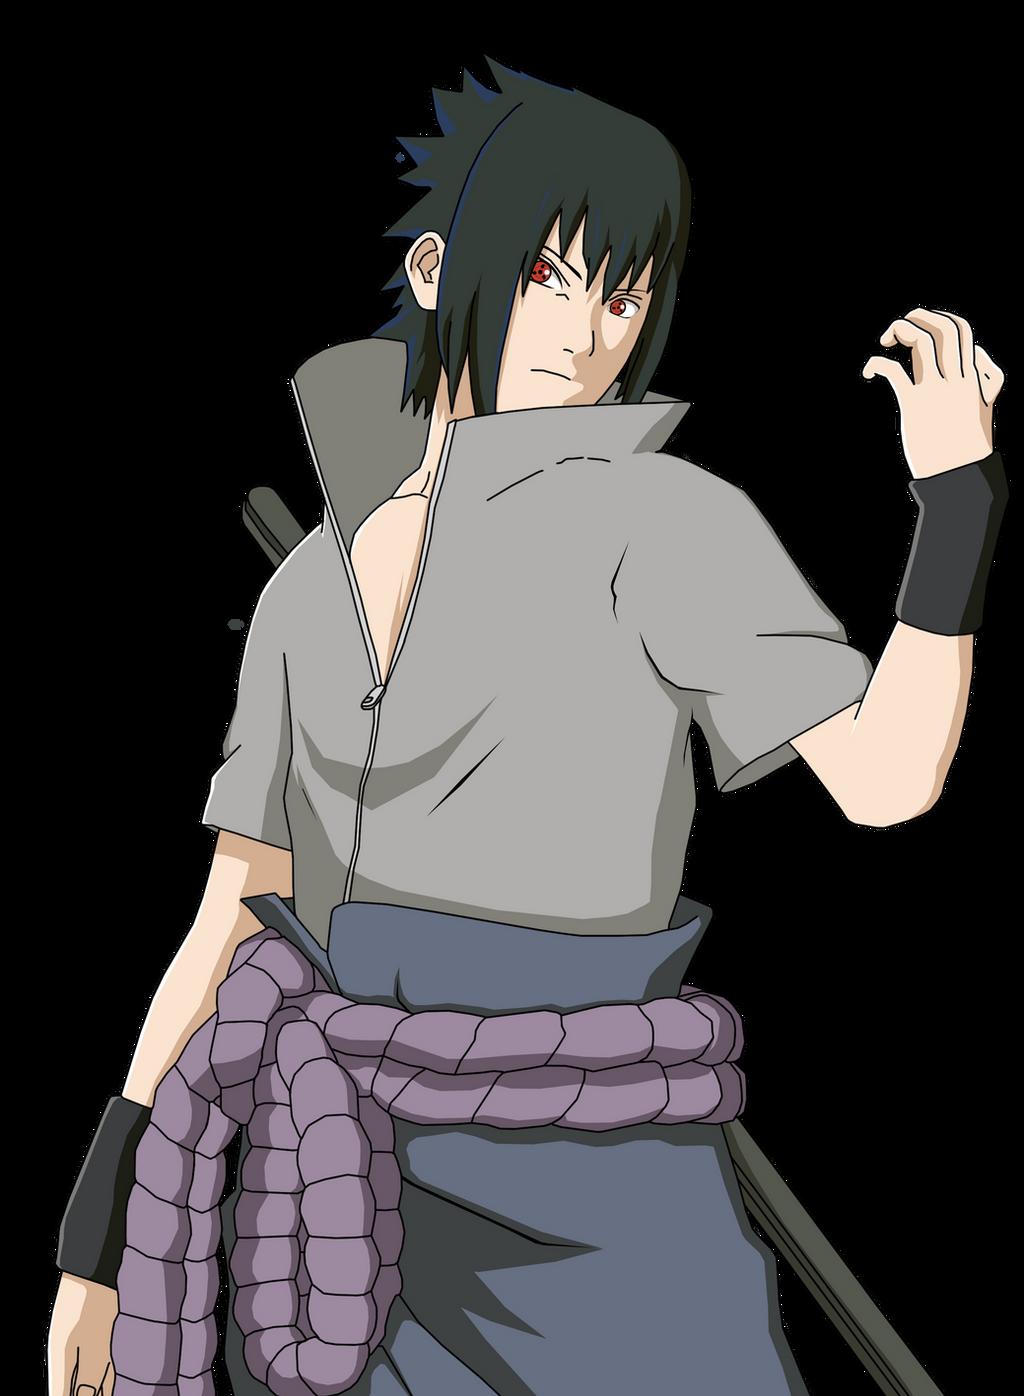 naruto shippuden sasuke uchiha sharingan by iennidesign on deviantart